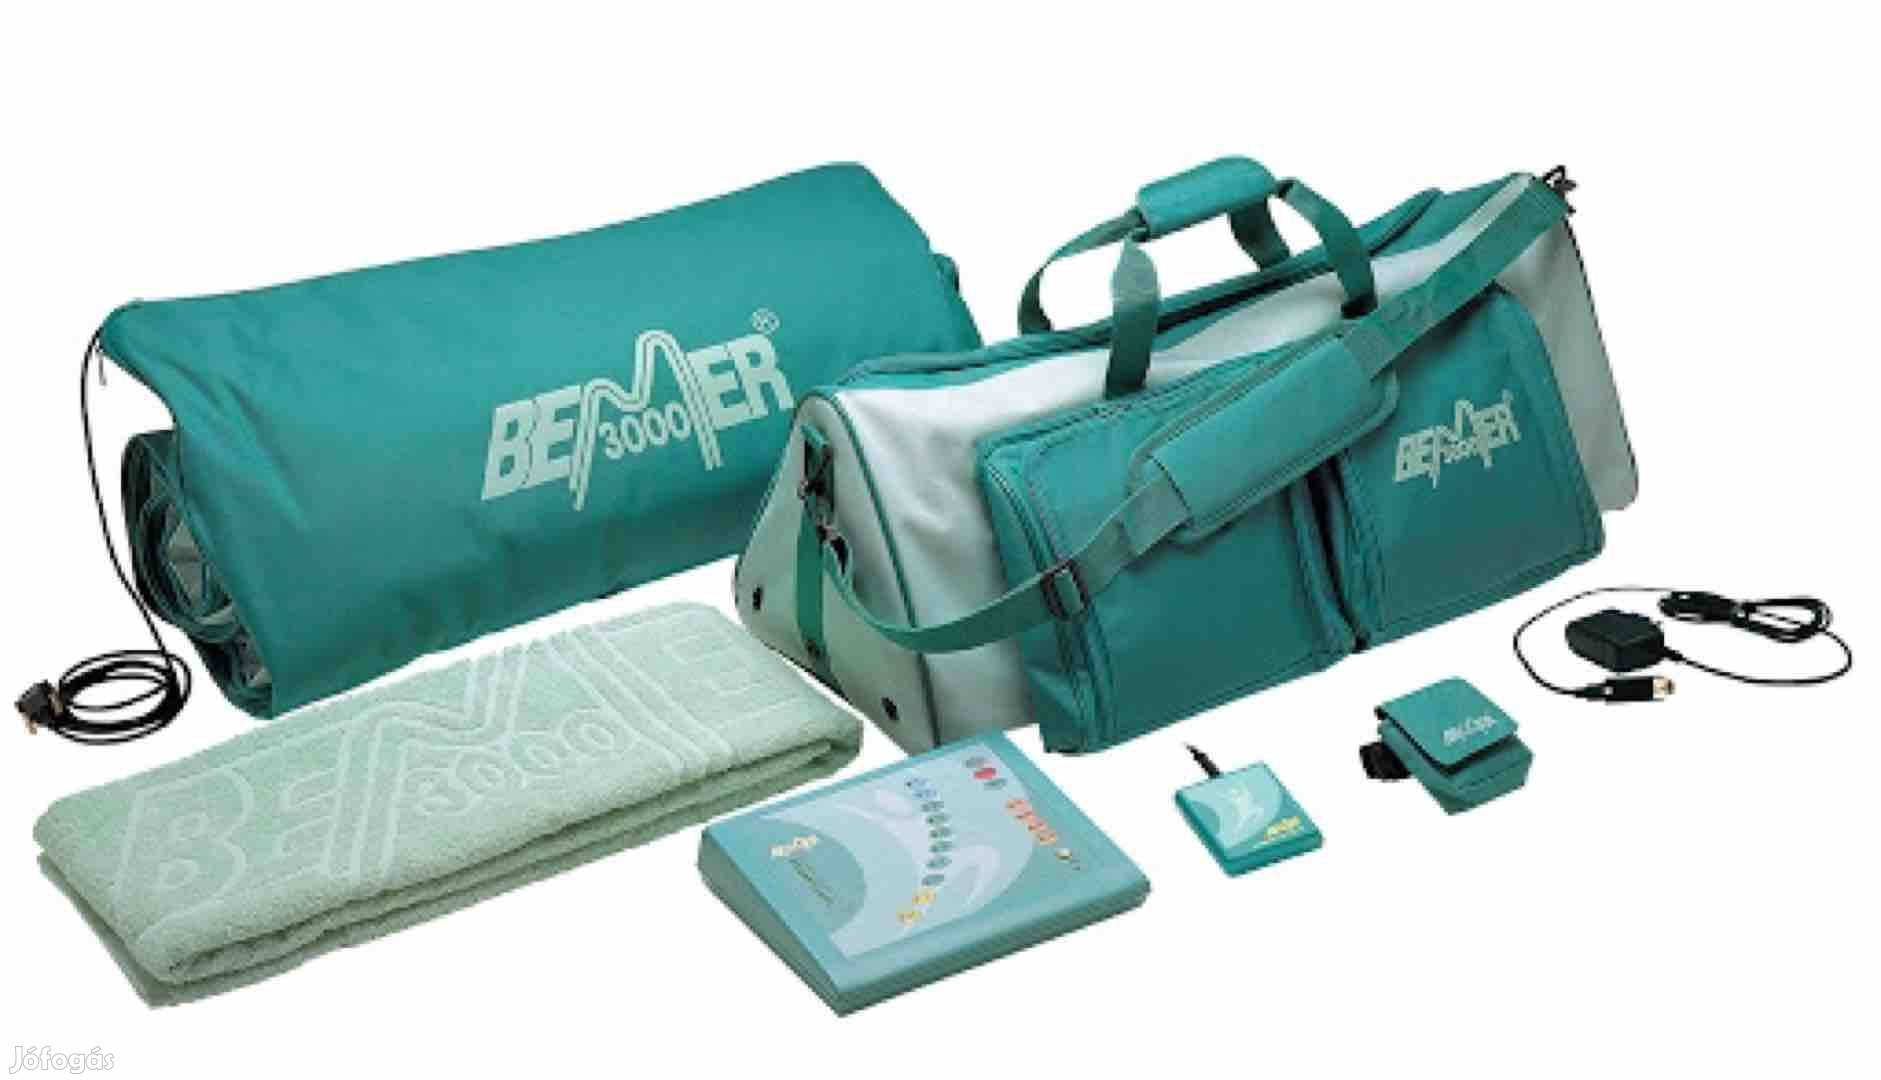 Keresek: BEMER 3000, BEMER Classic Set,BEMER pro Set,bemer professional set